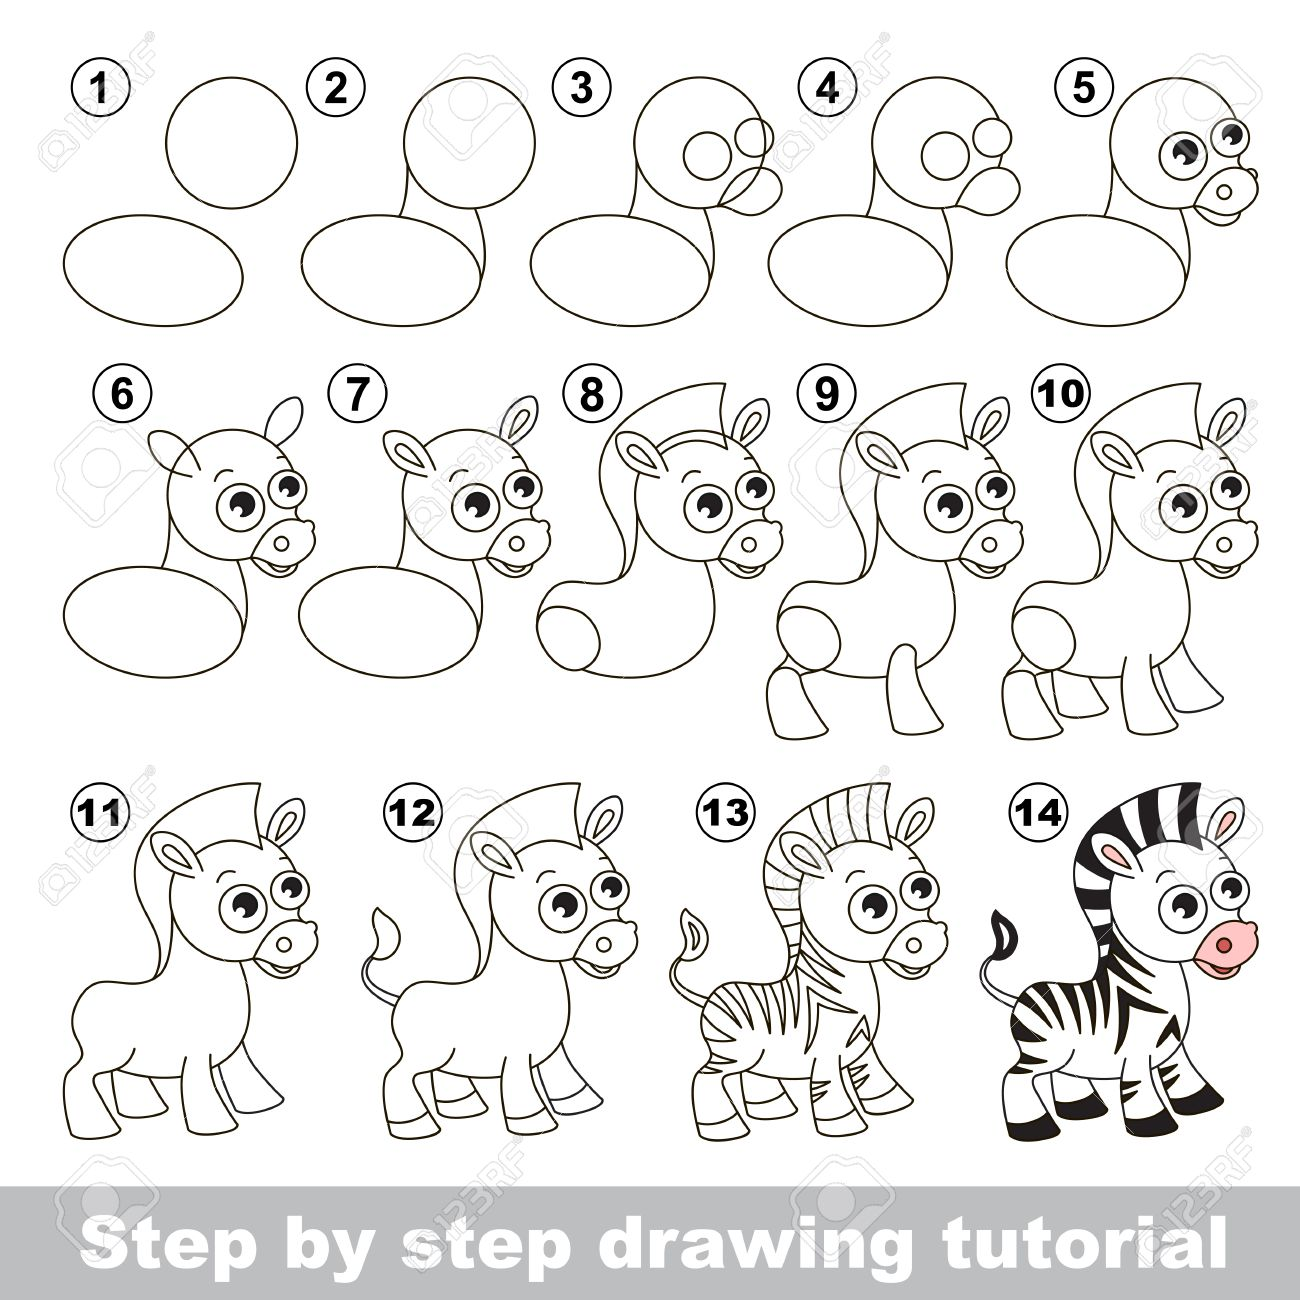 Zebra Drawing Step By Step At Getdrawings